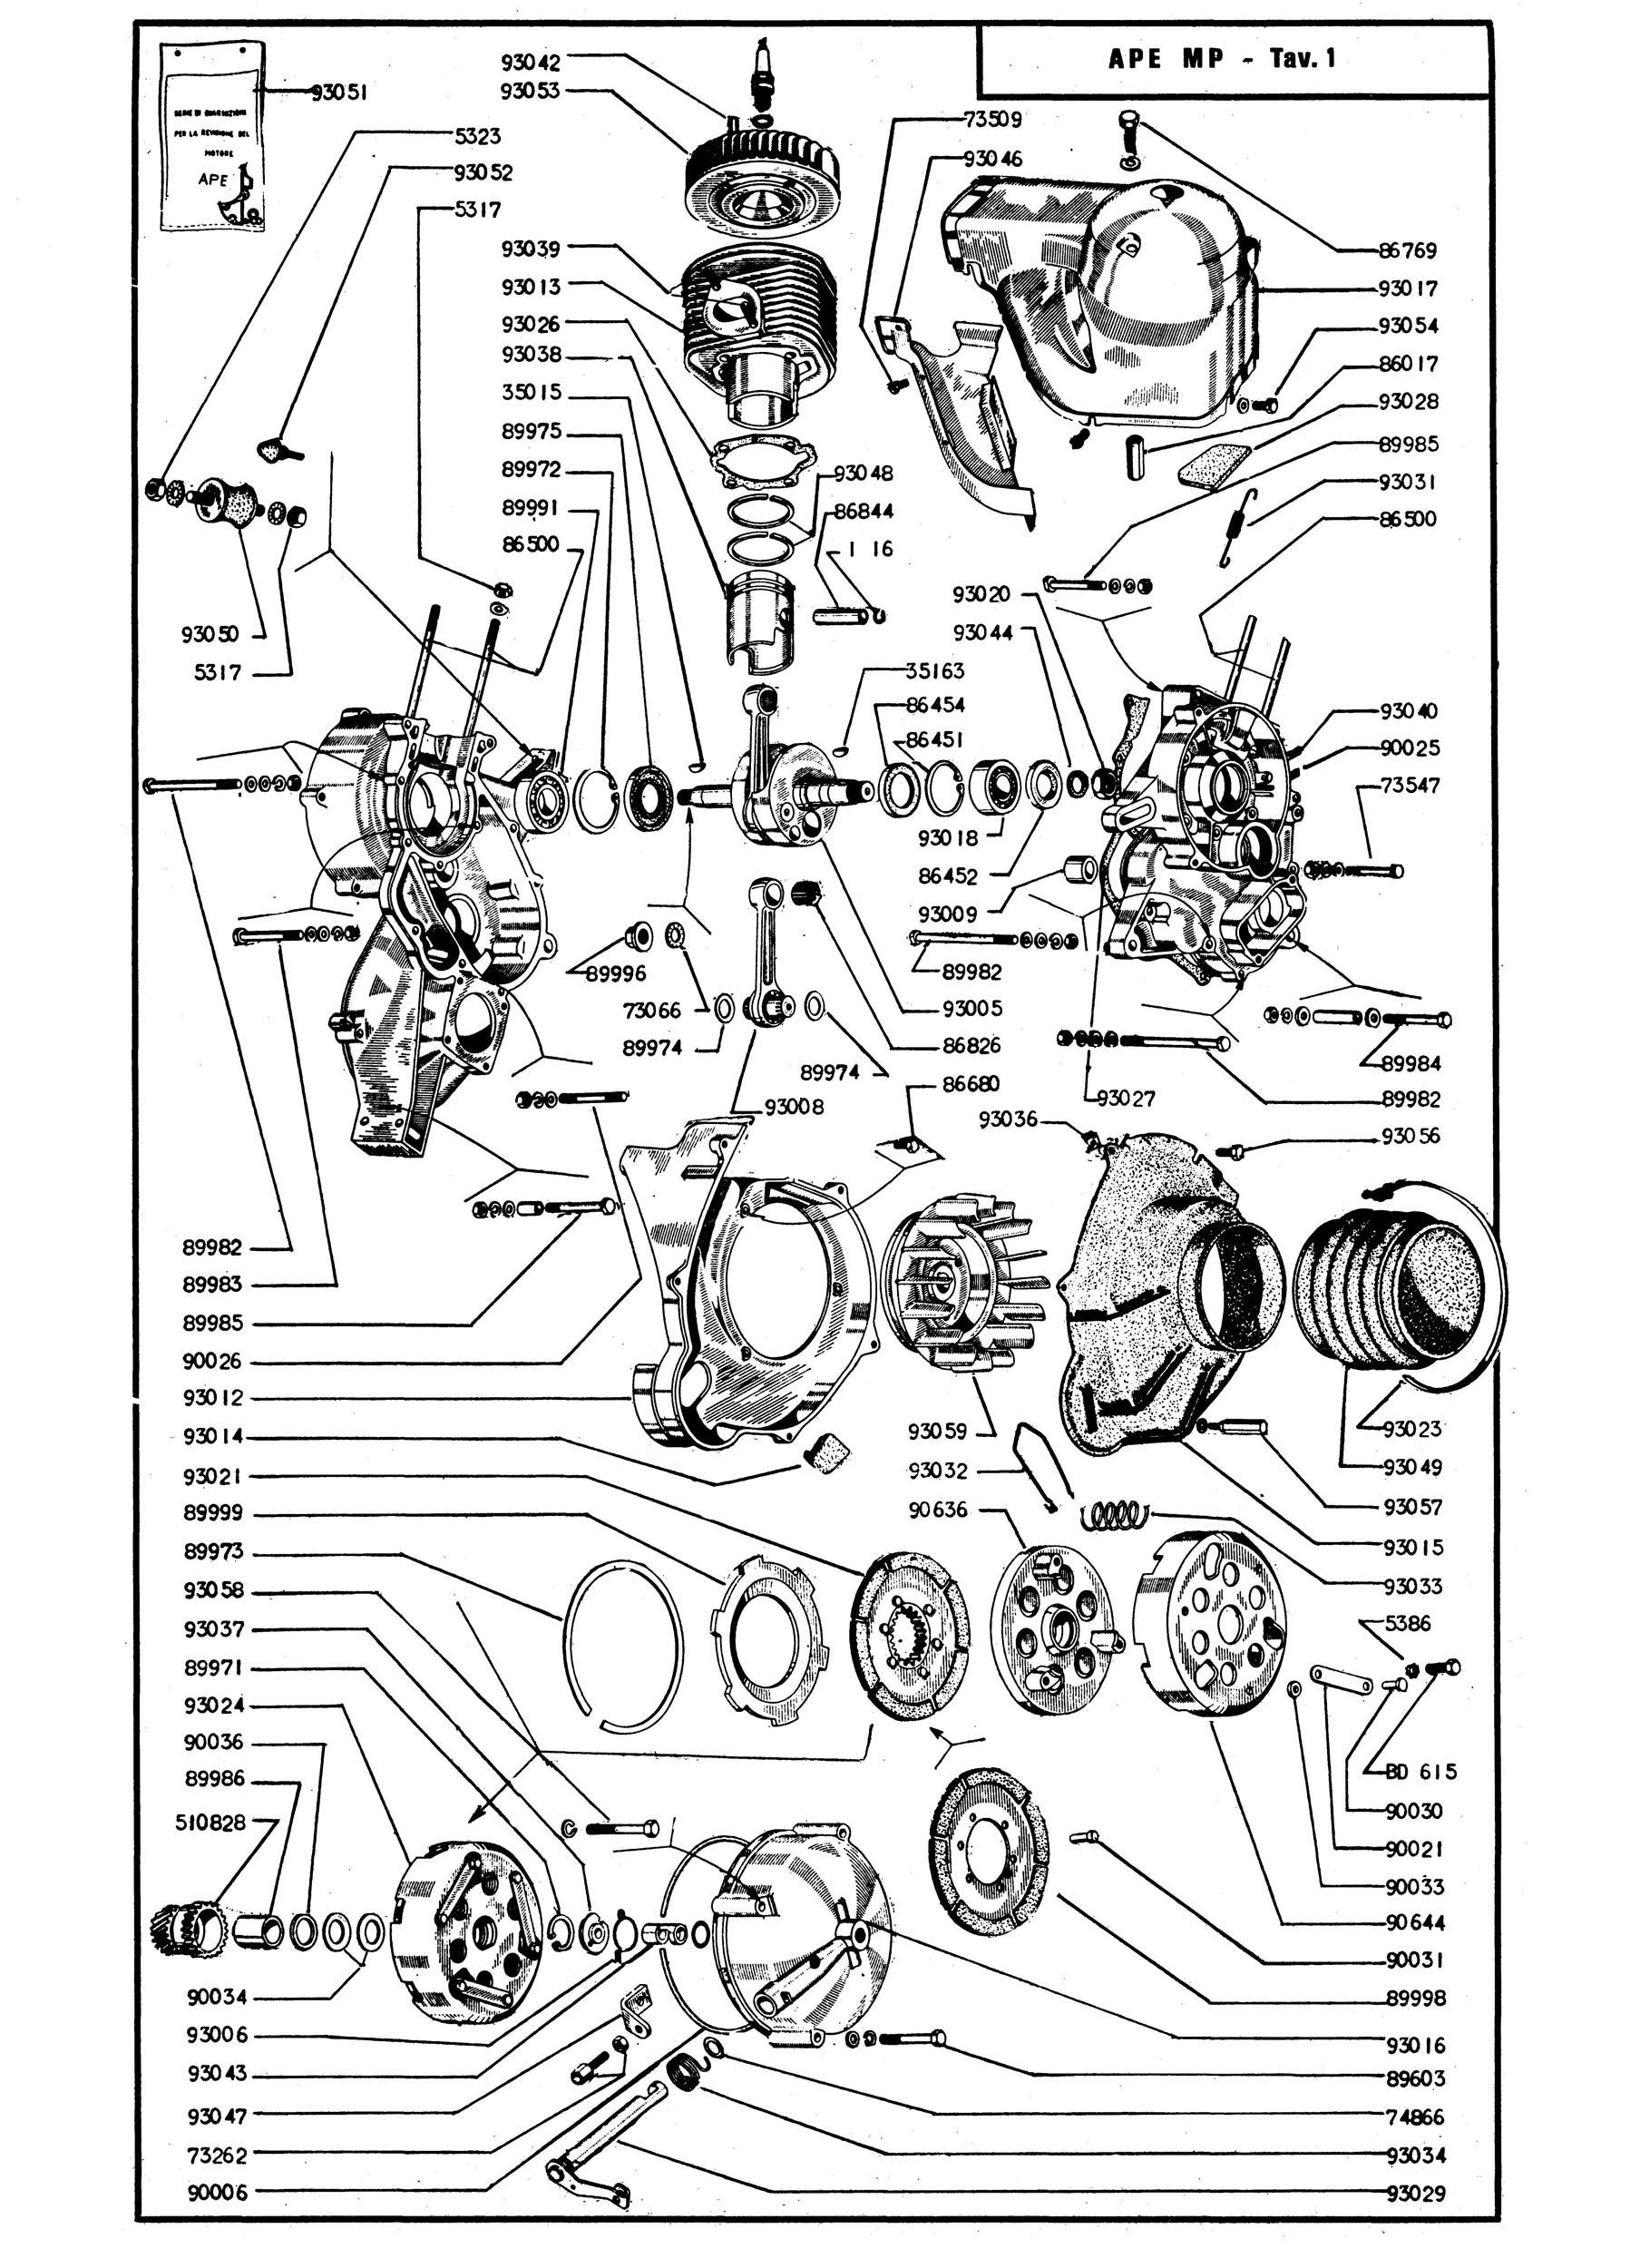 catalogue of spare parts piaggio ape mp vespadoc rh vespadoc com piaggio ape spare parts list piaggio ape spare parts list